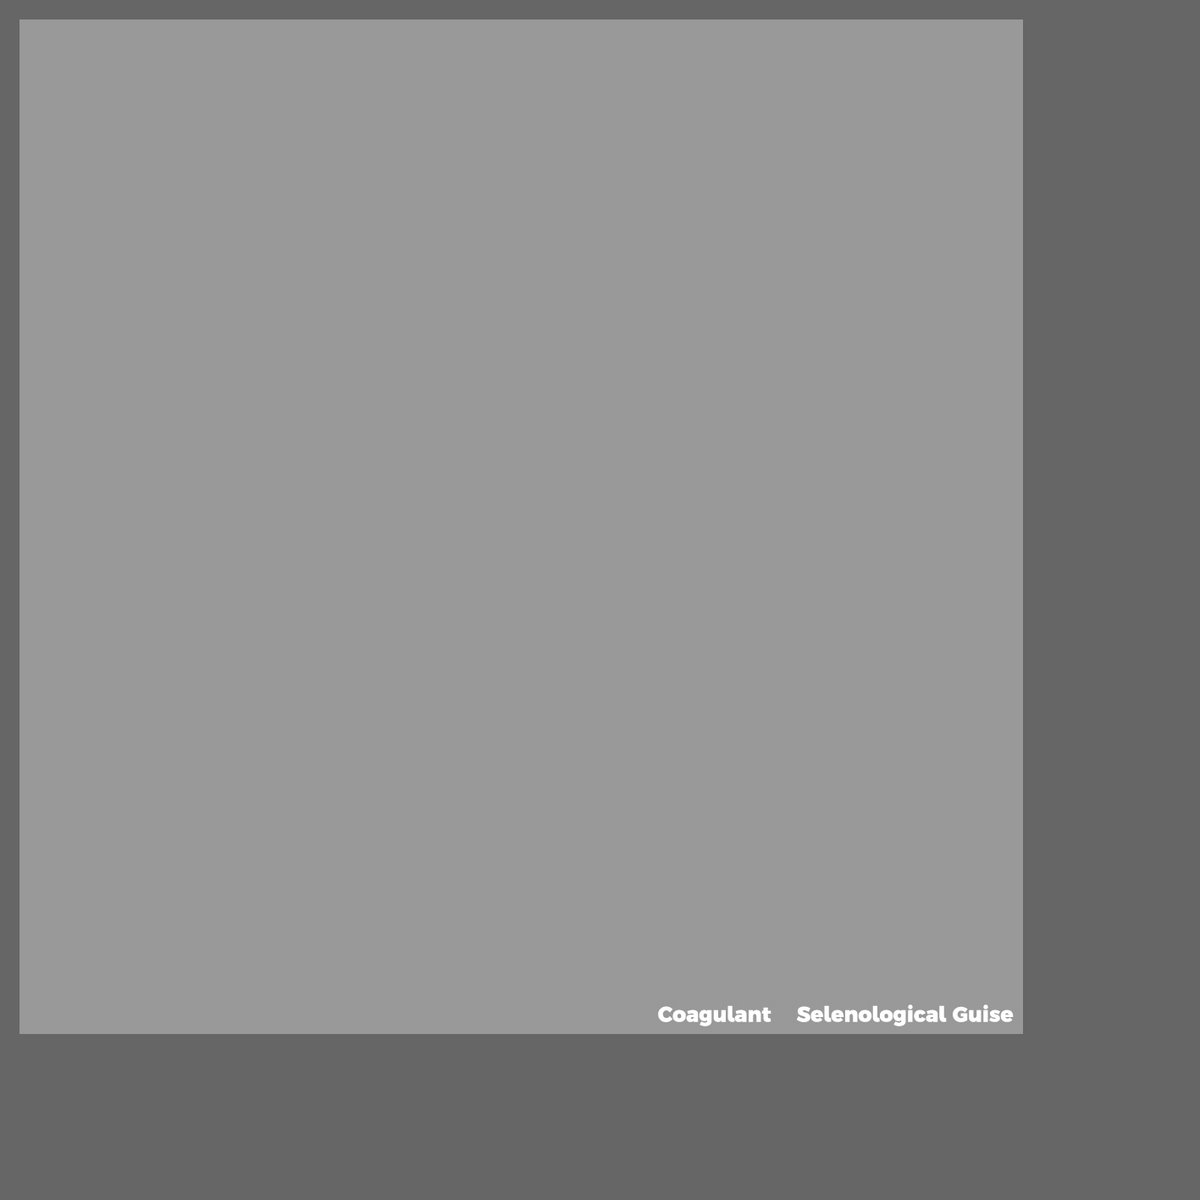 Coagulant – Selenological Guise